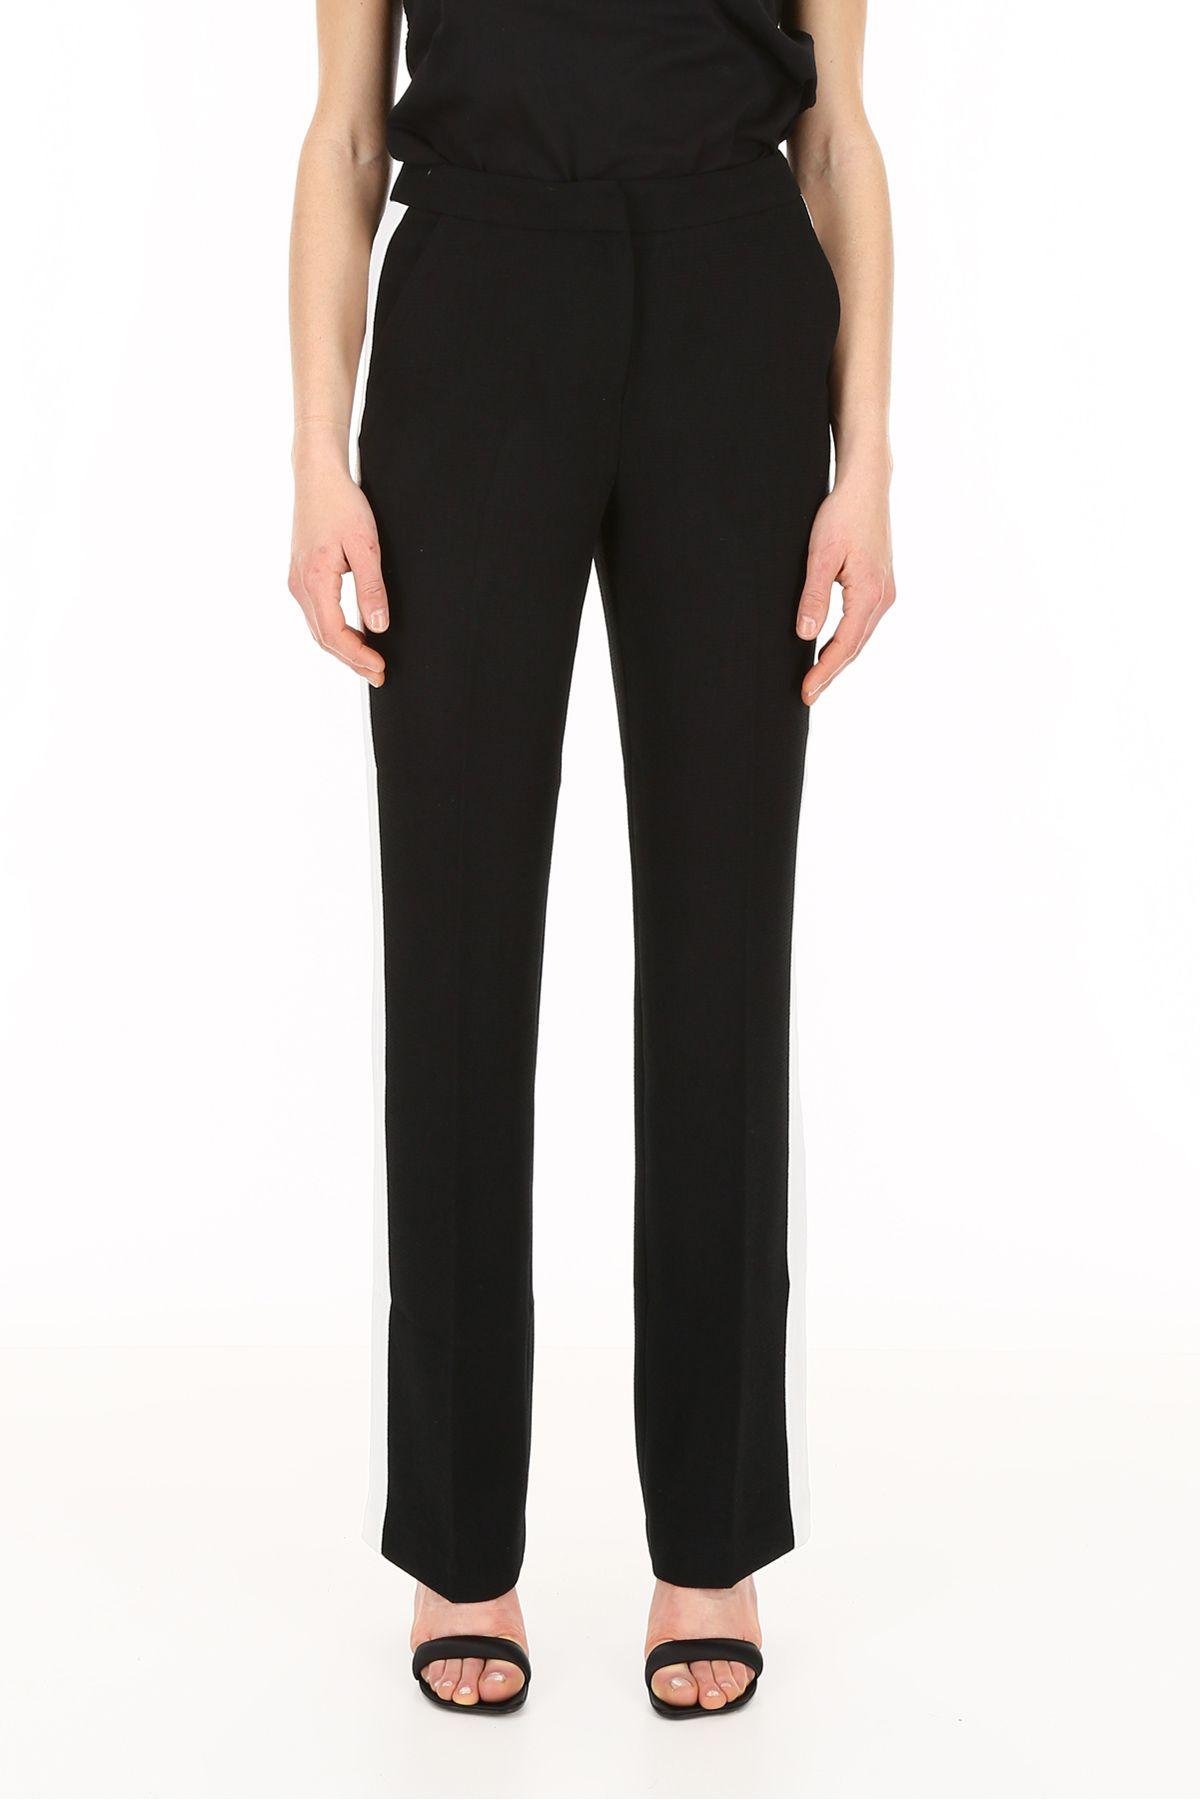 Pants for Women On Sale, Black, poliestere, 2017, 34 Essentiel